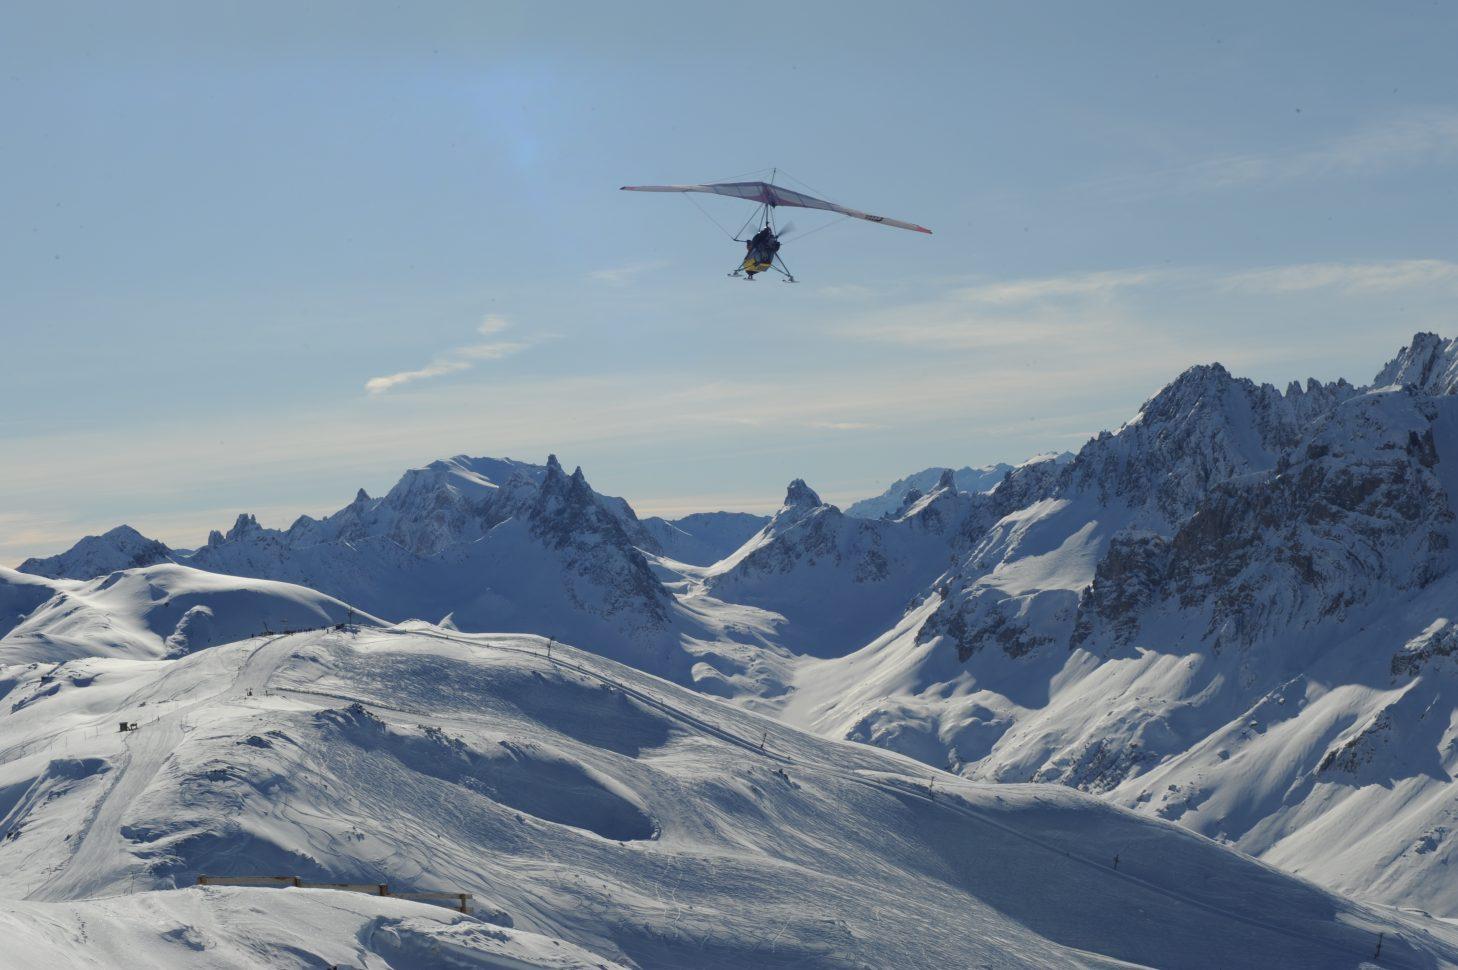 Survol du domaine skiable Galibier-Thabor en ULM